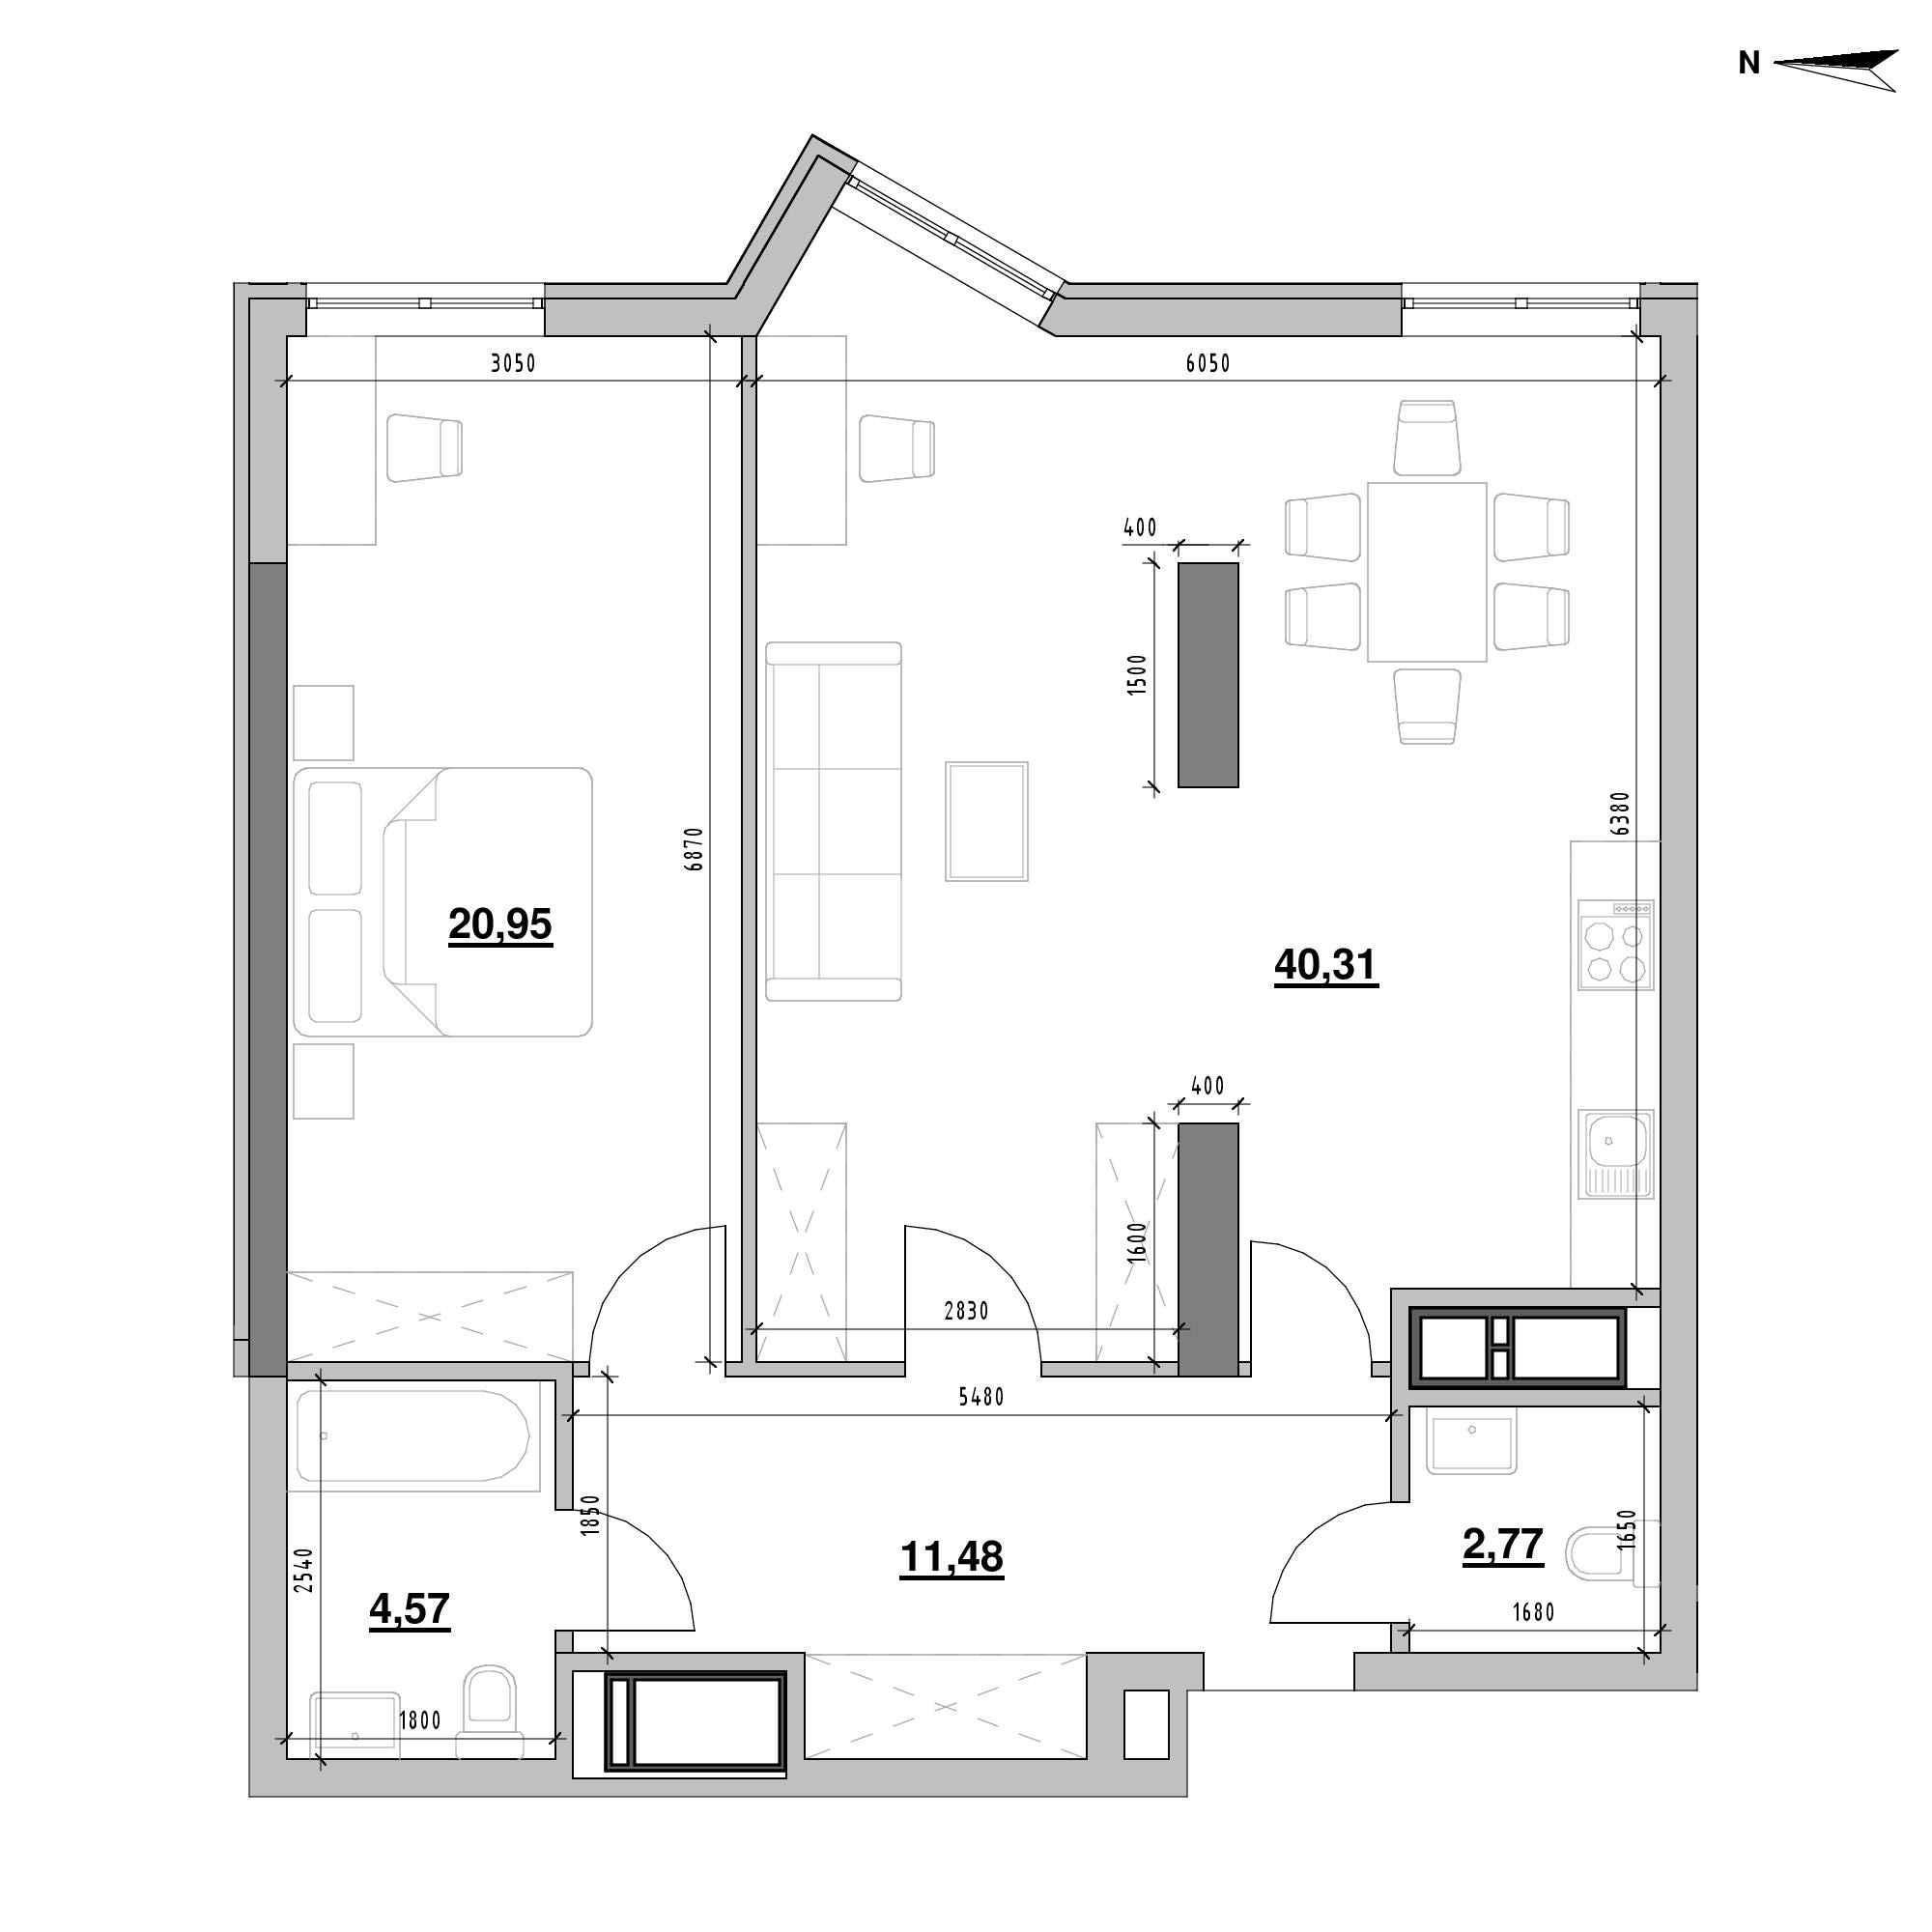 ЖК Nordica Residence: планування 1-кімнатної квартири, №8, 80.08 м<sup>2</sup>